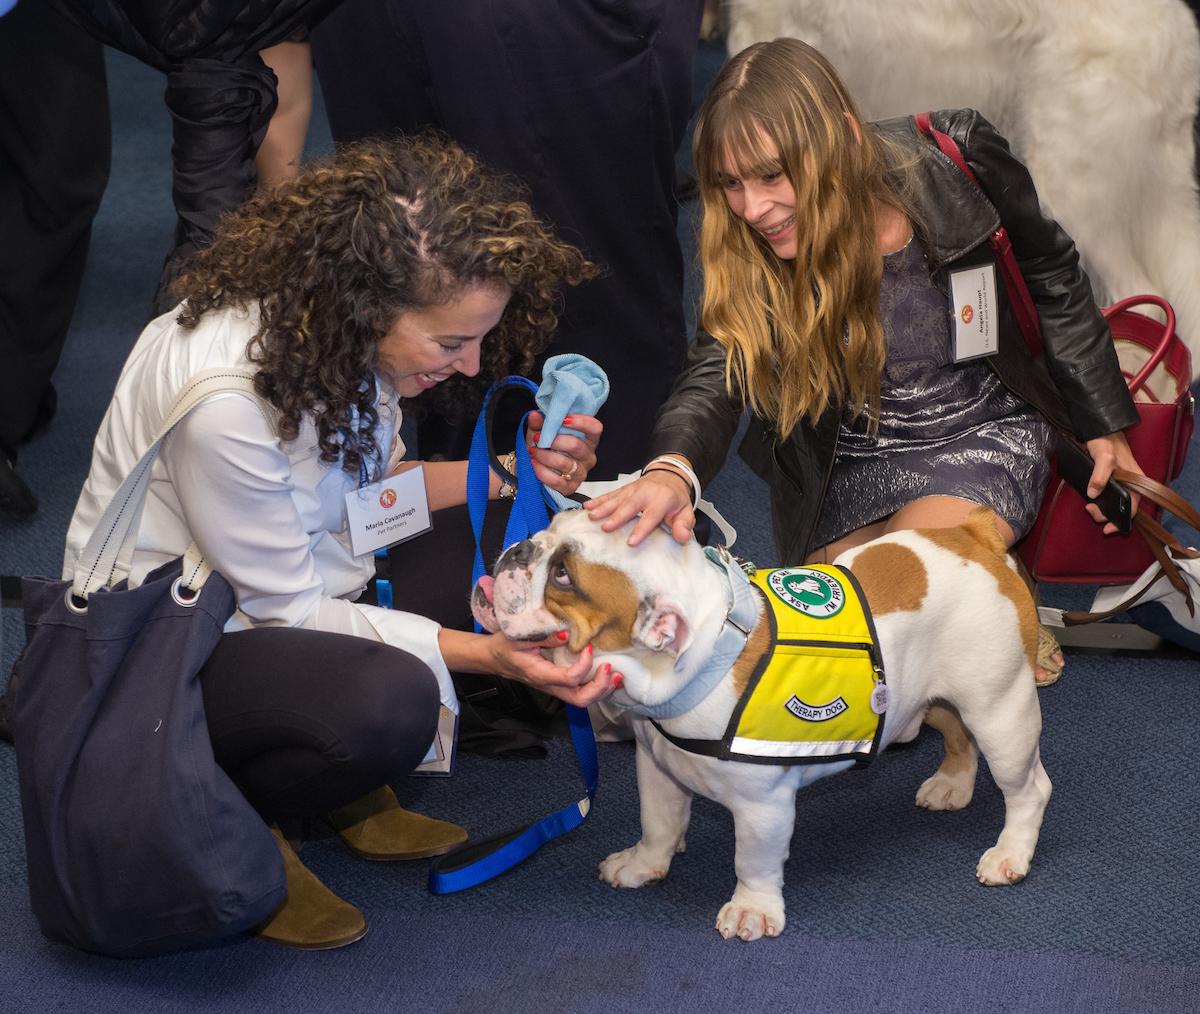 Pet Health Insurance - Where Do You Turn For Advice?